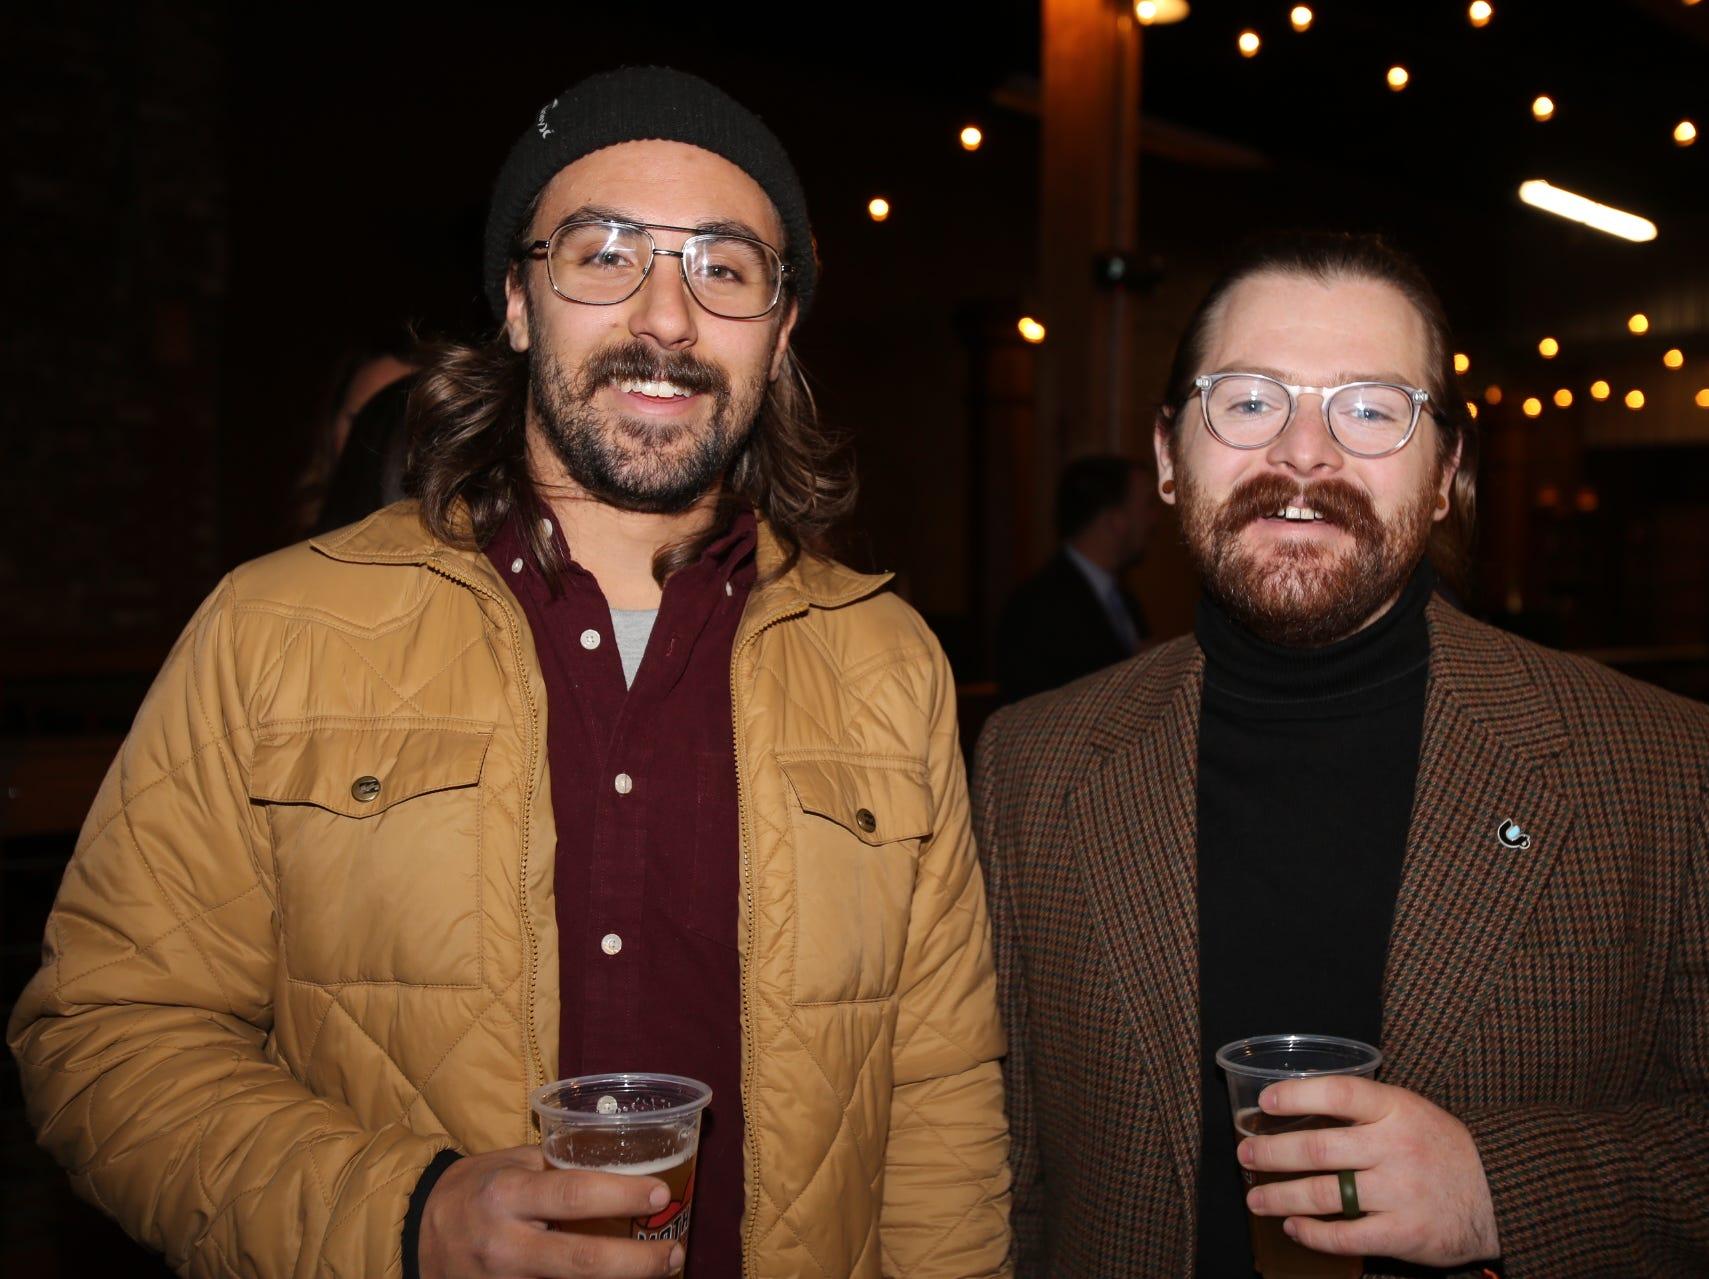 Chris Olson and Austin Elliott